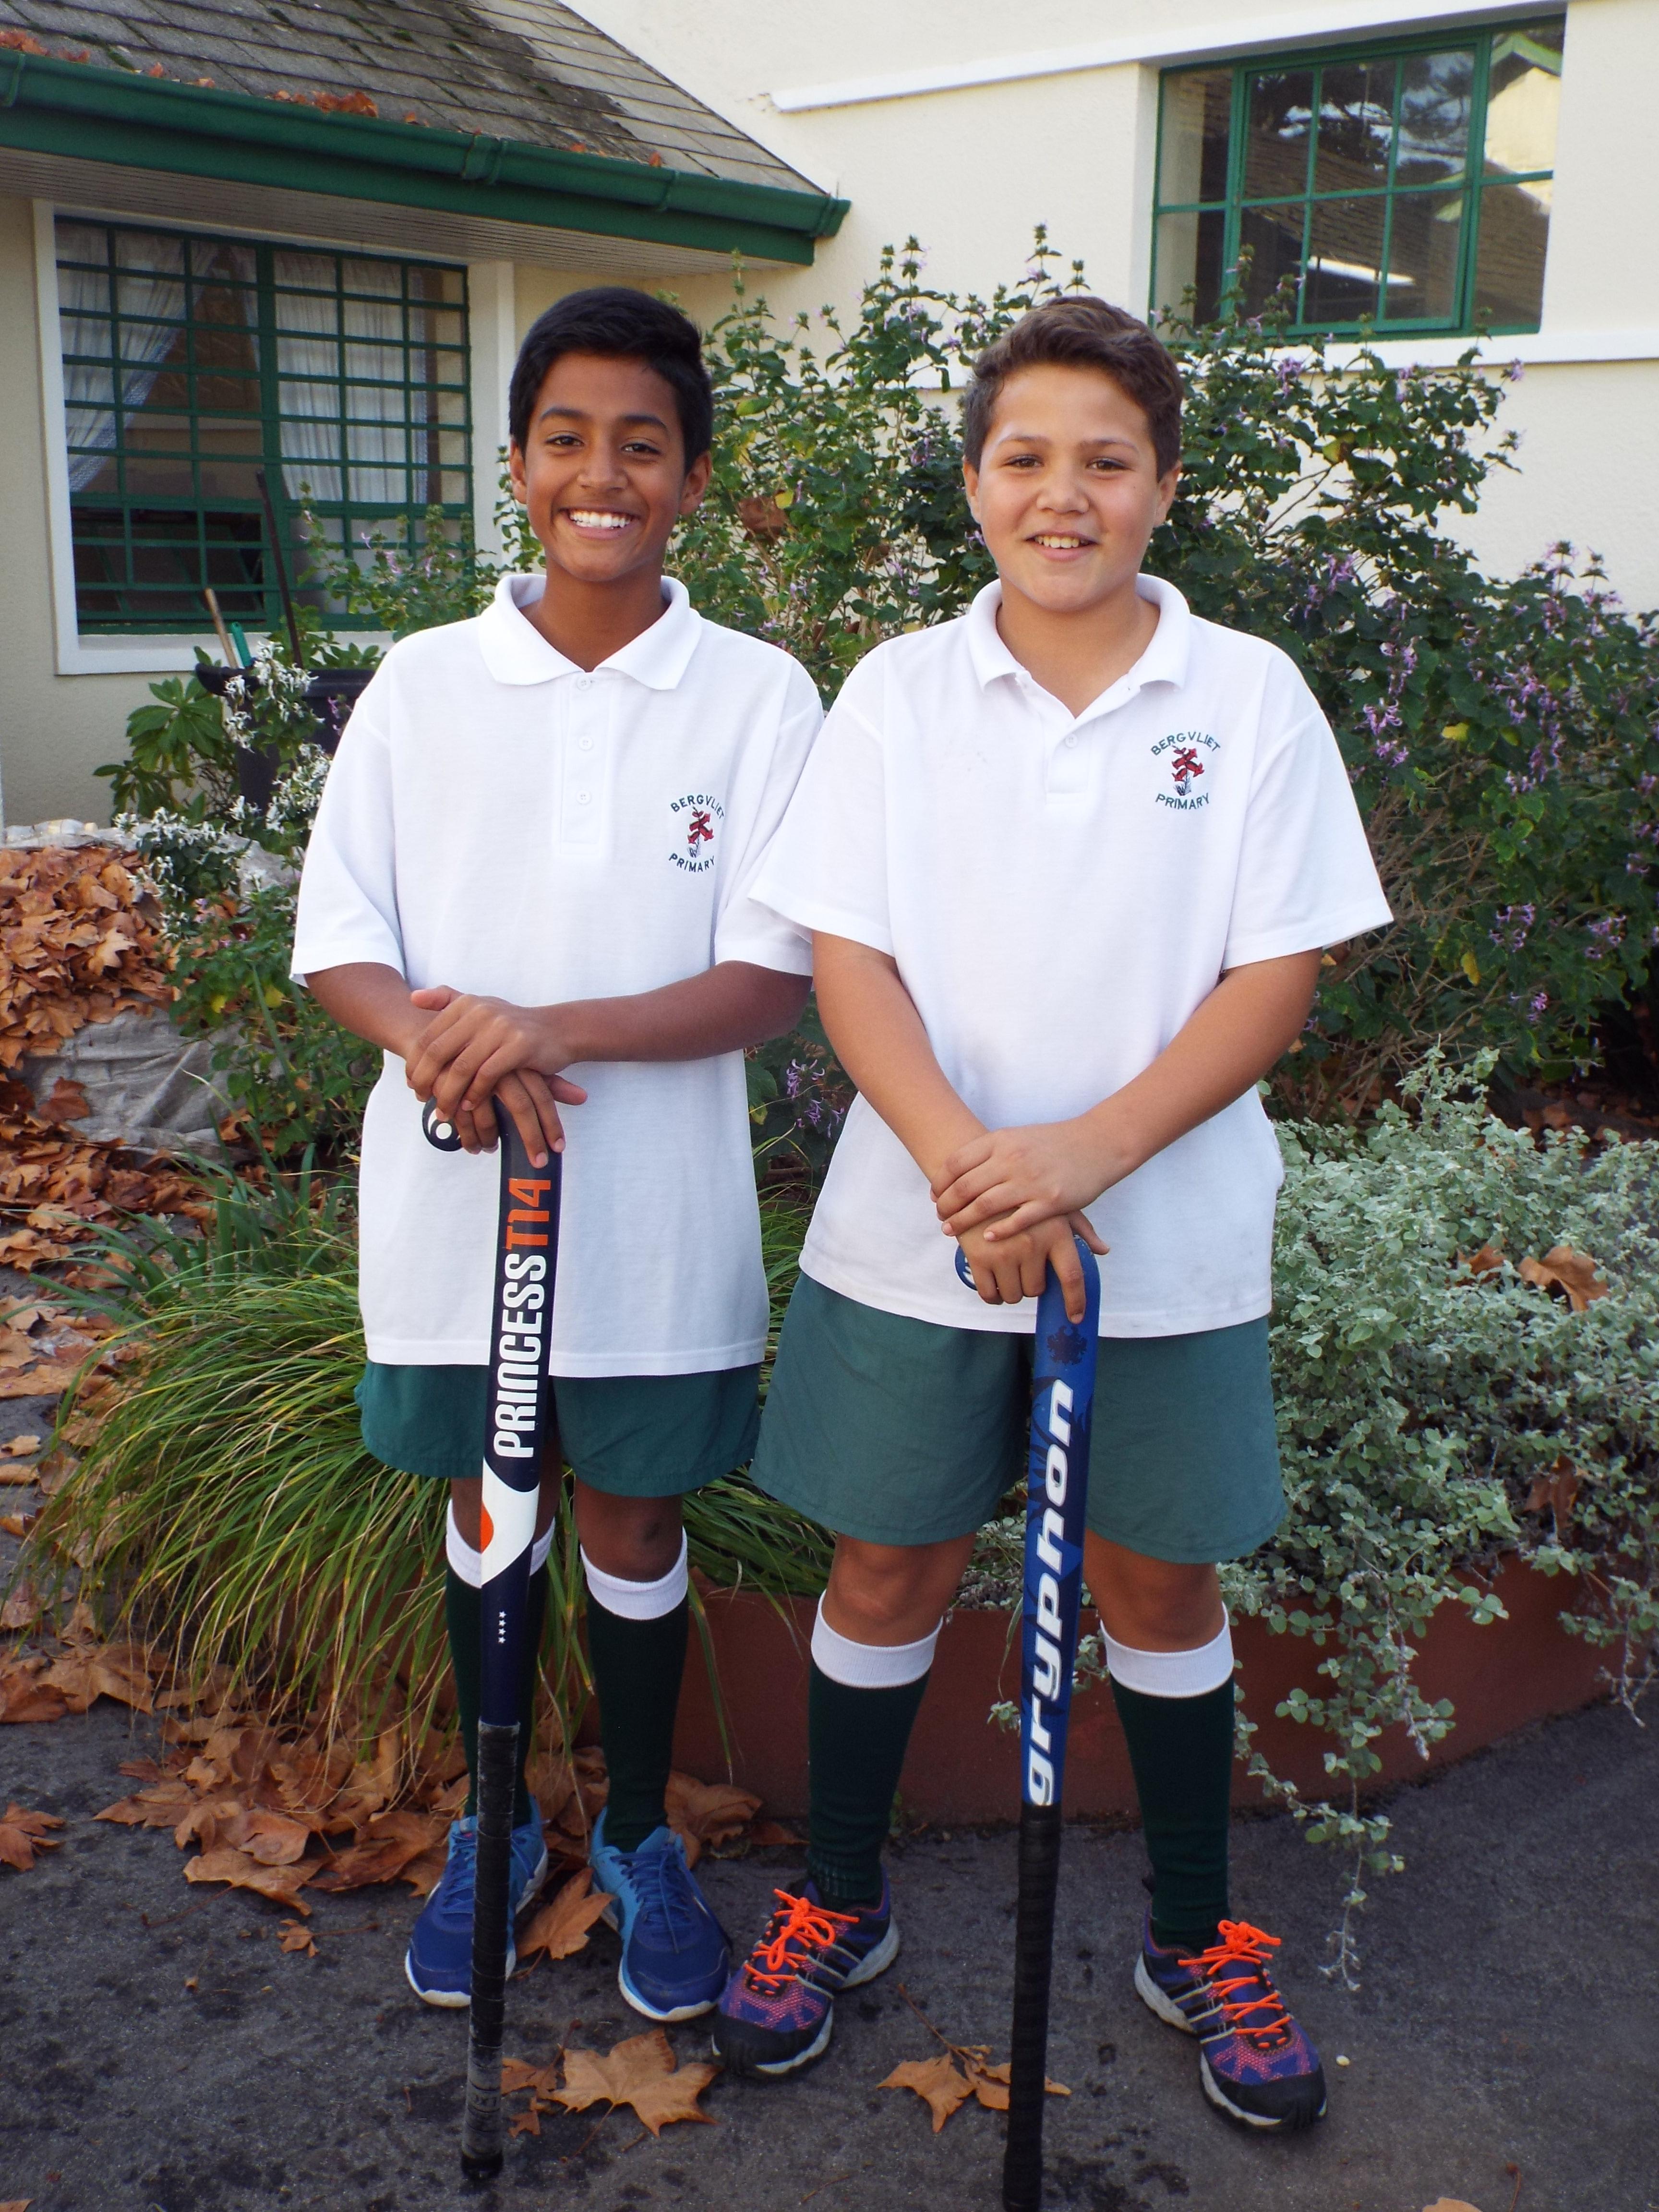 Hockey boys